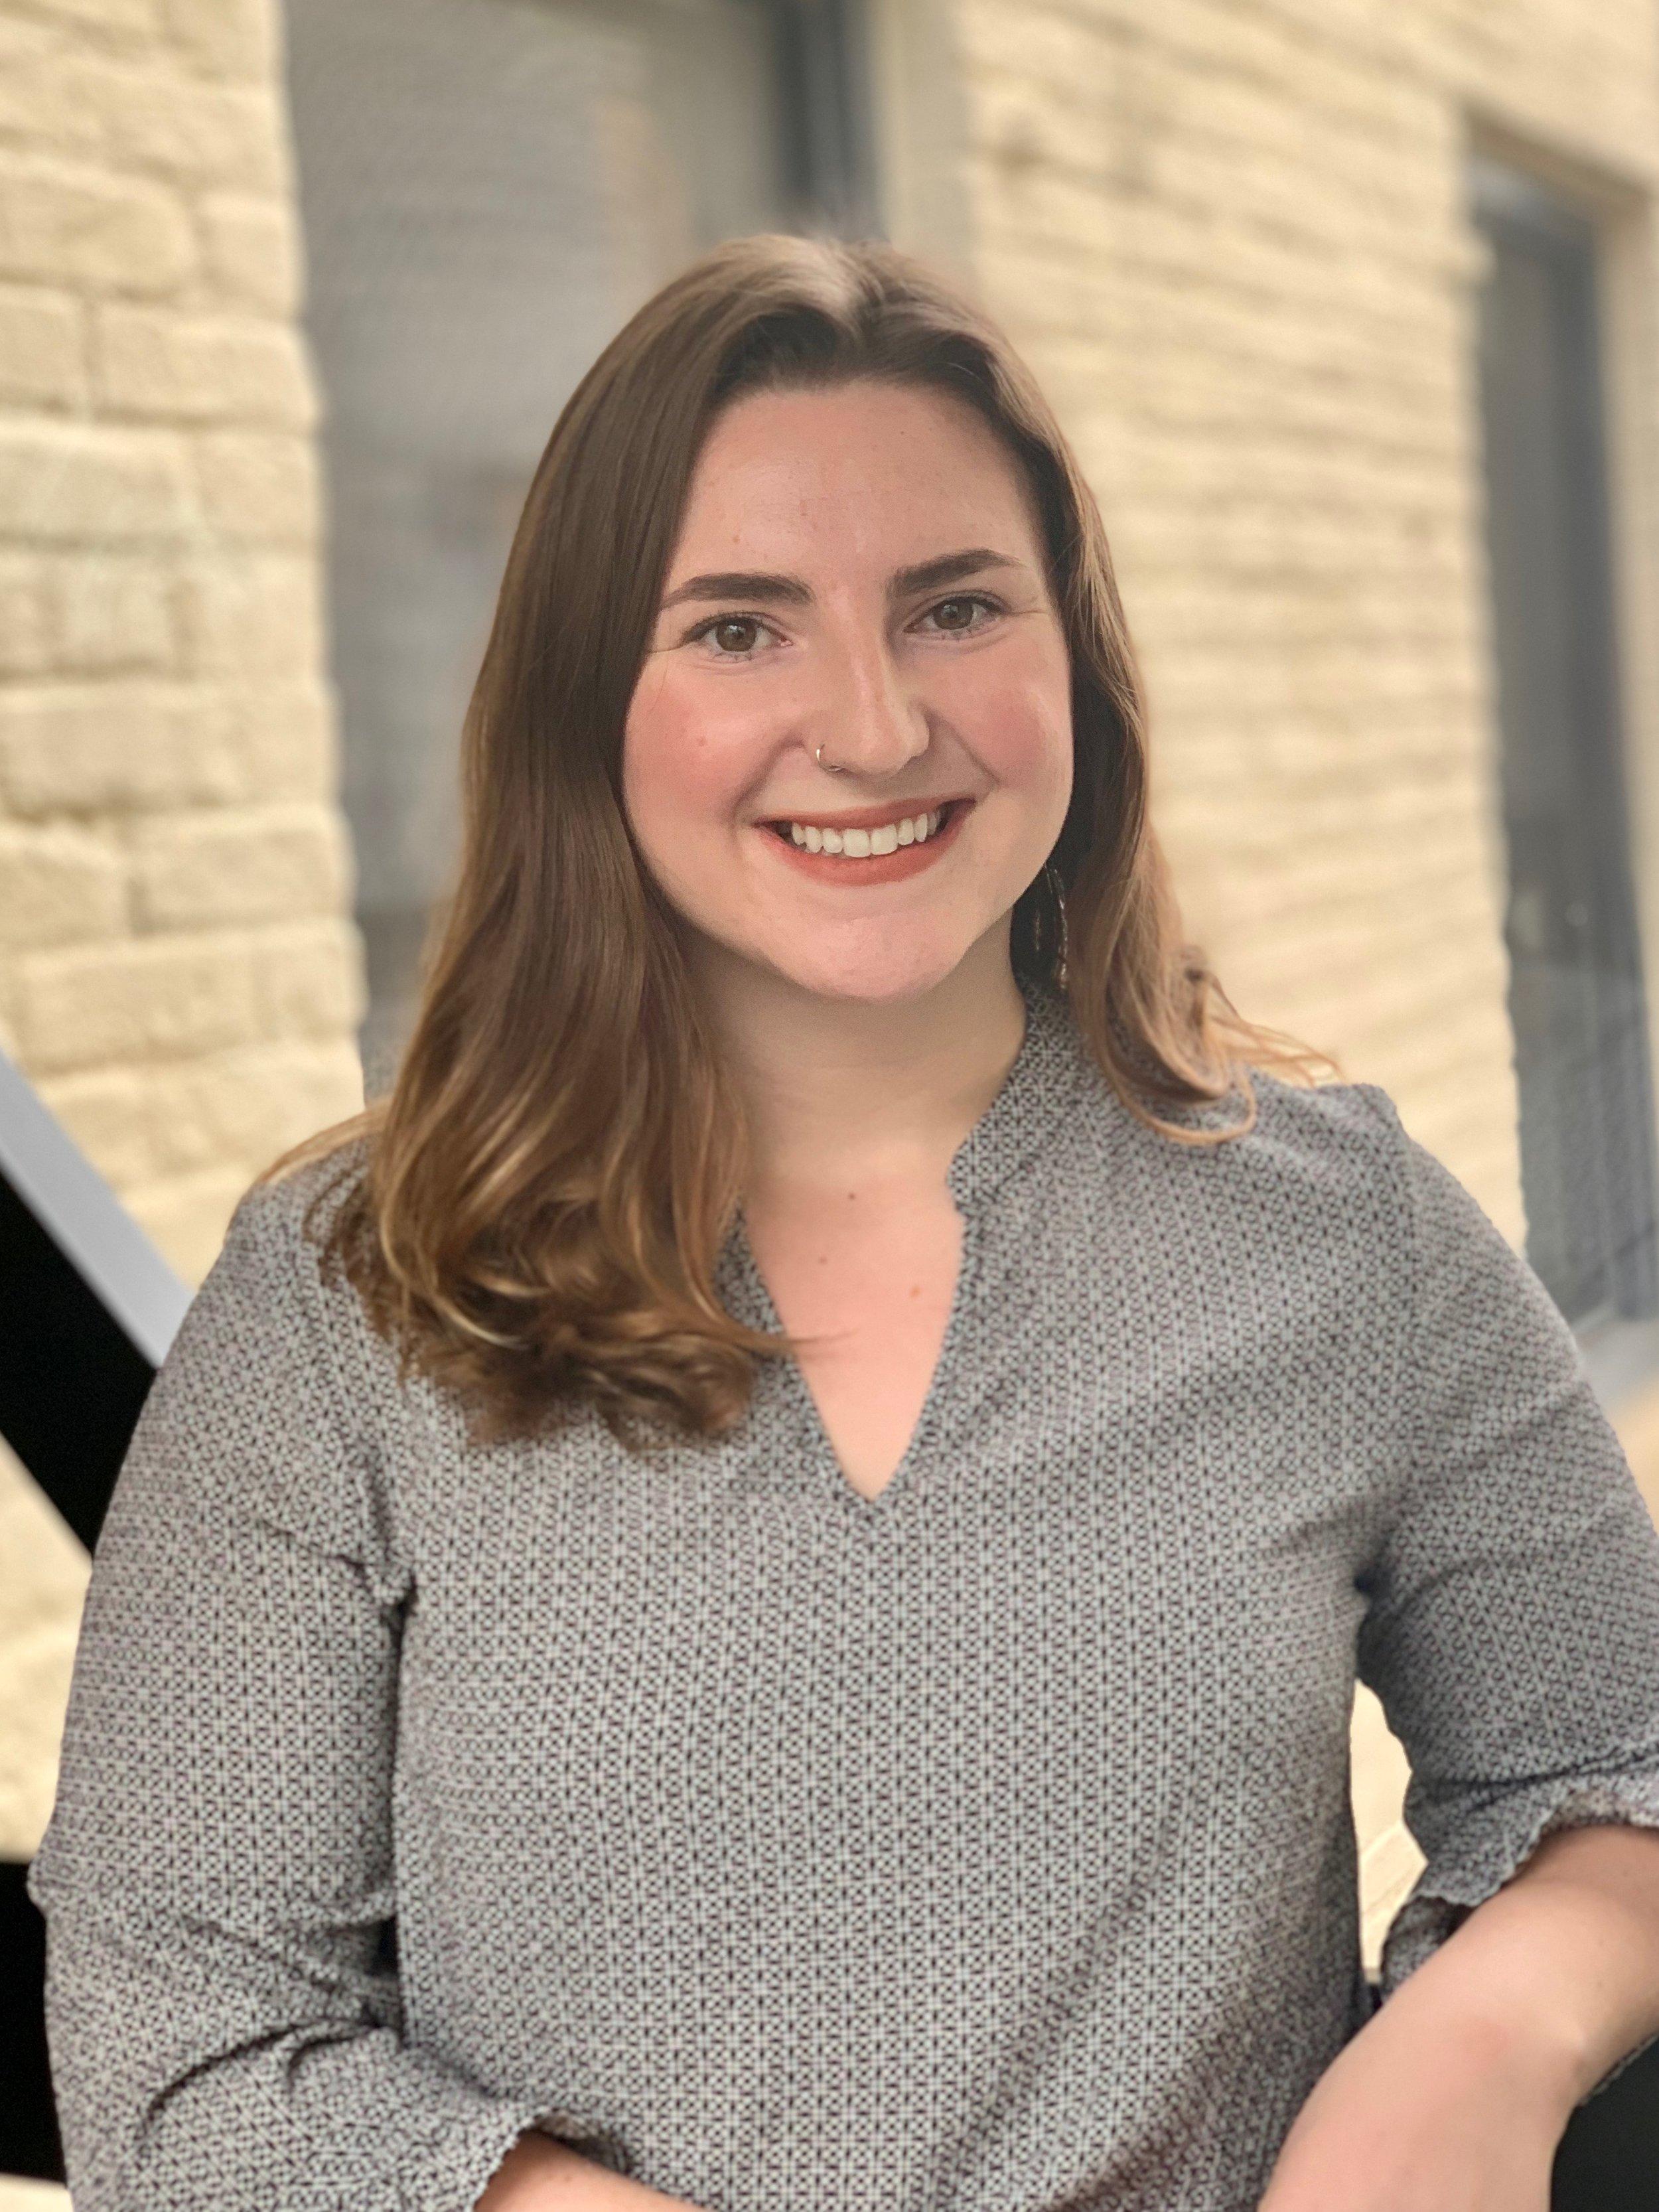 SamanthaFerguson - Administrative Coordinator